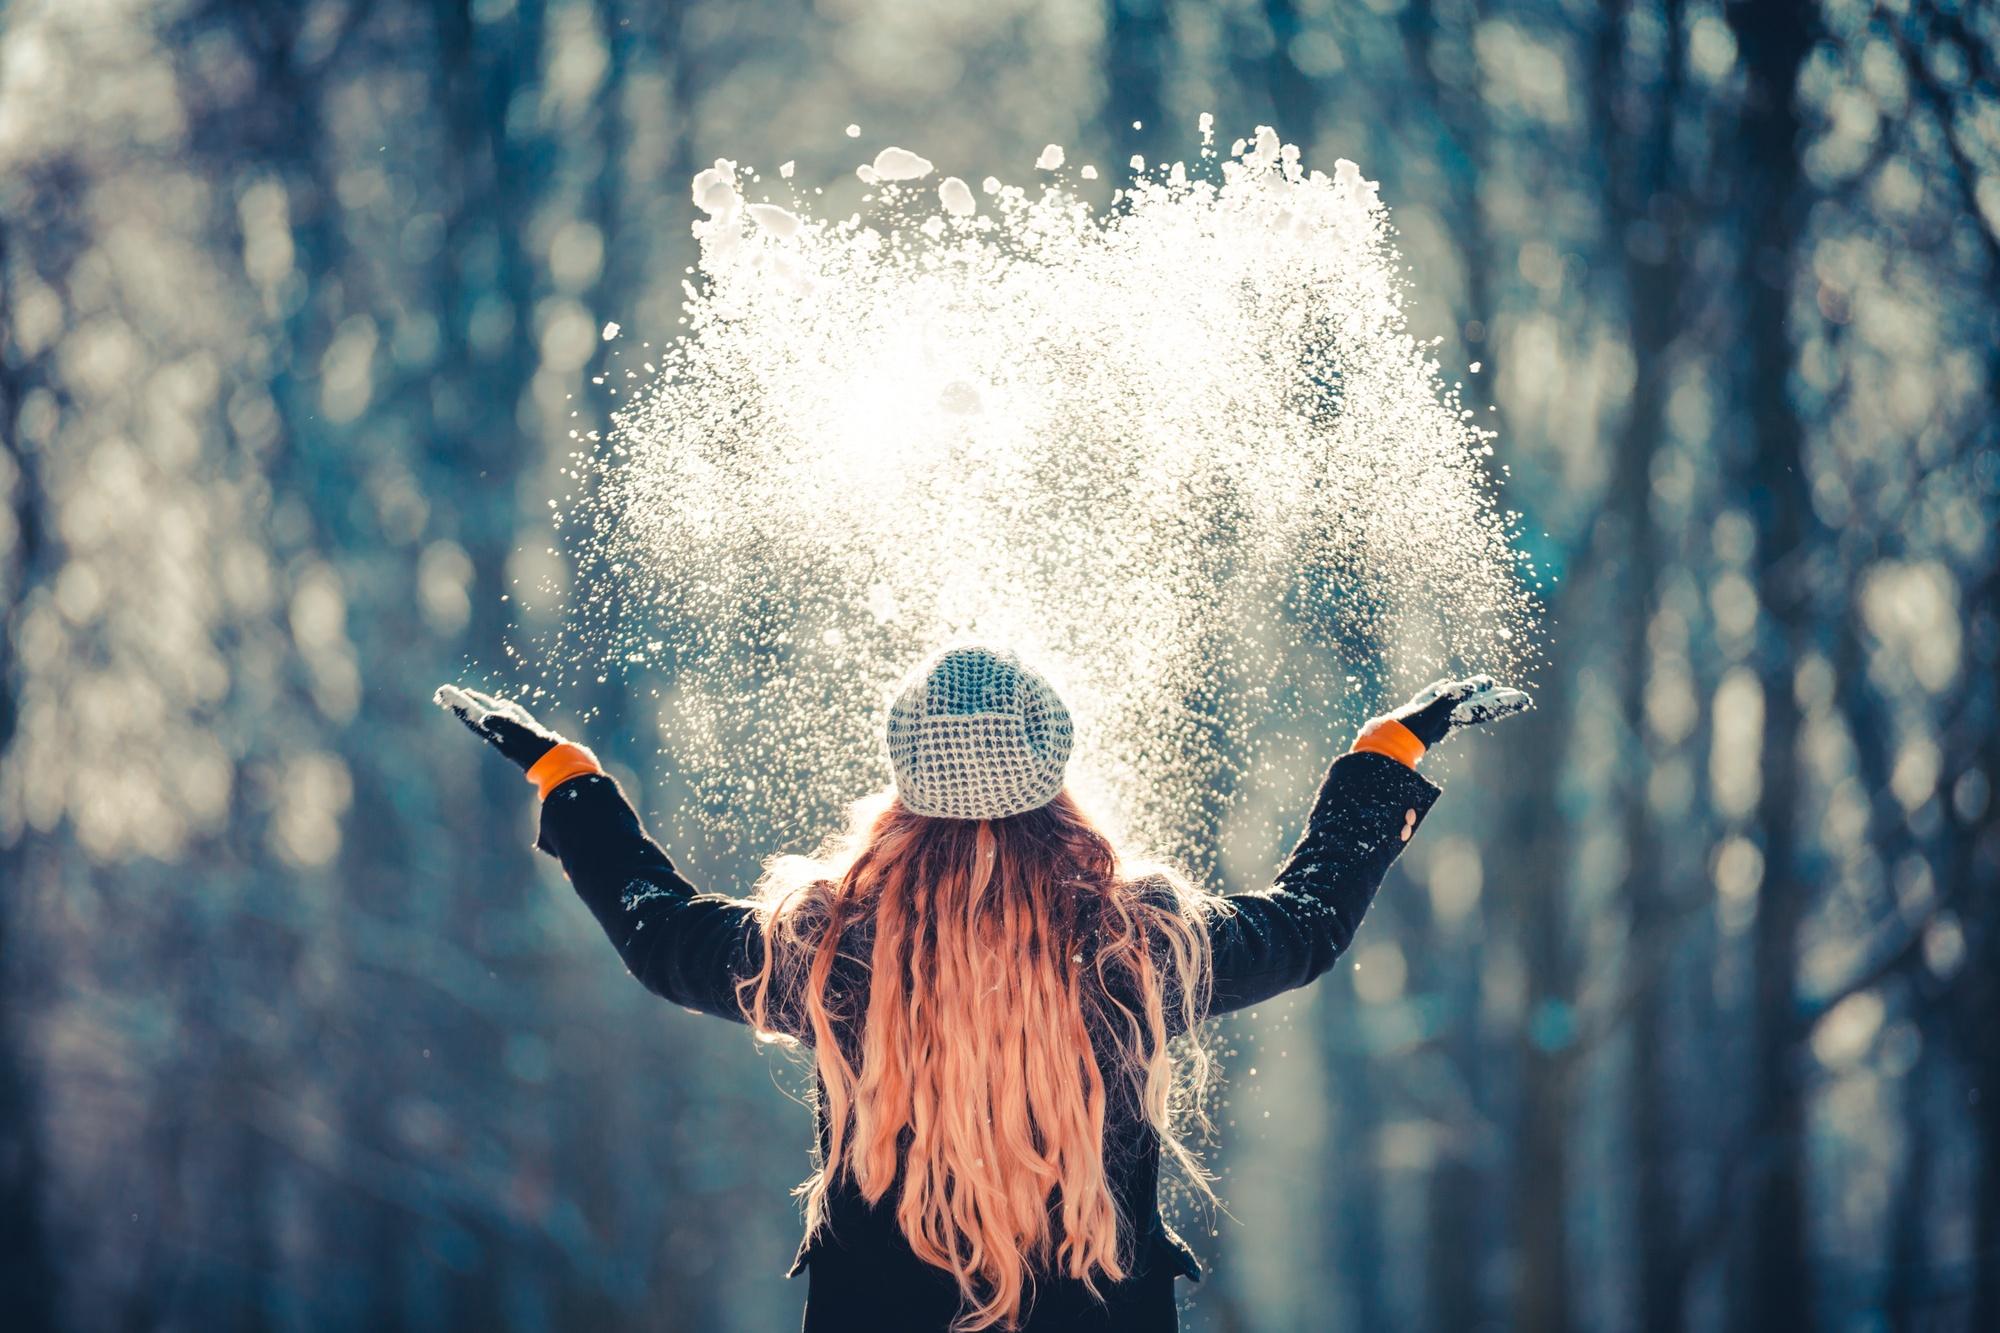 5 Wondrous Winter Weekend Getaways In New England